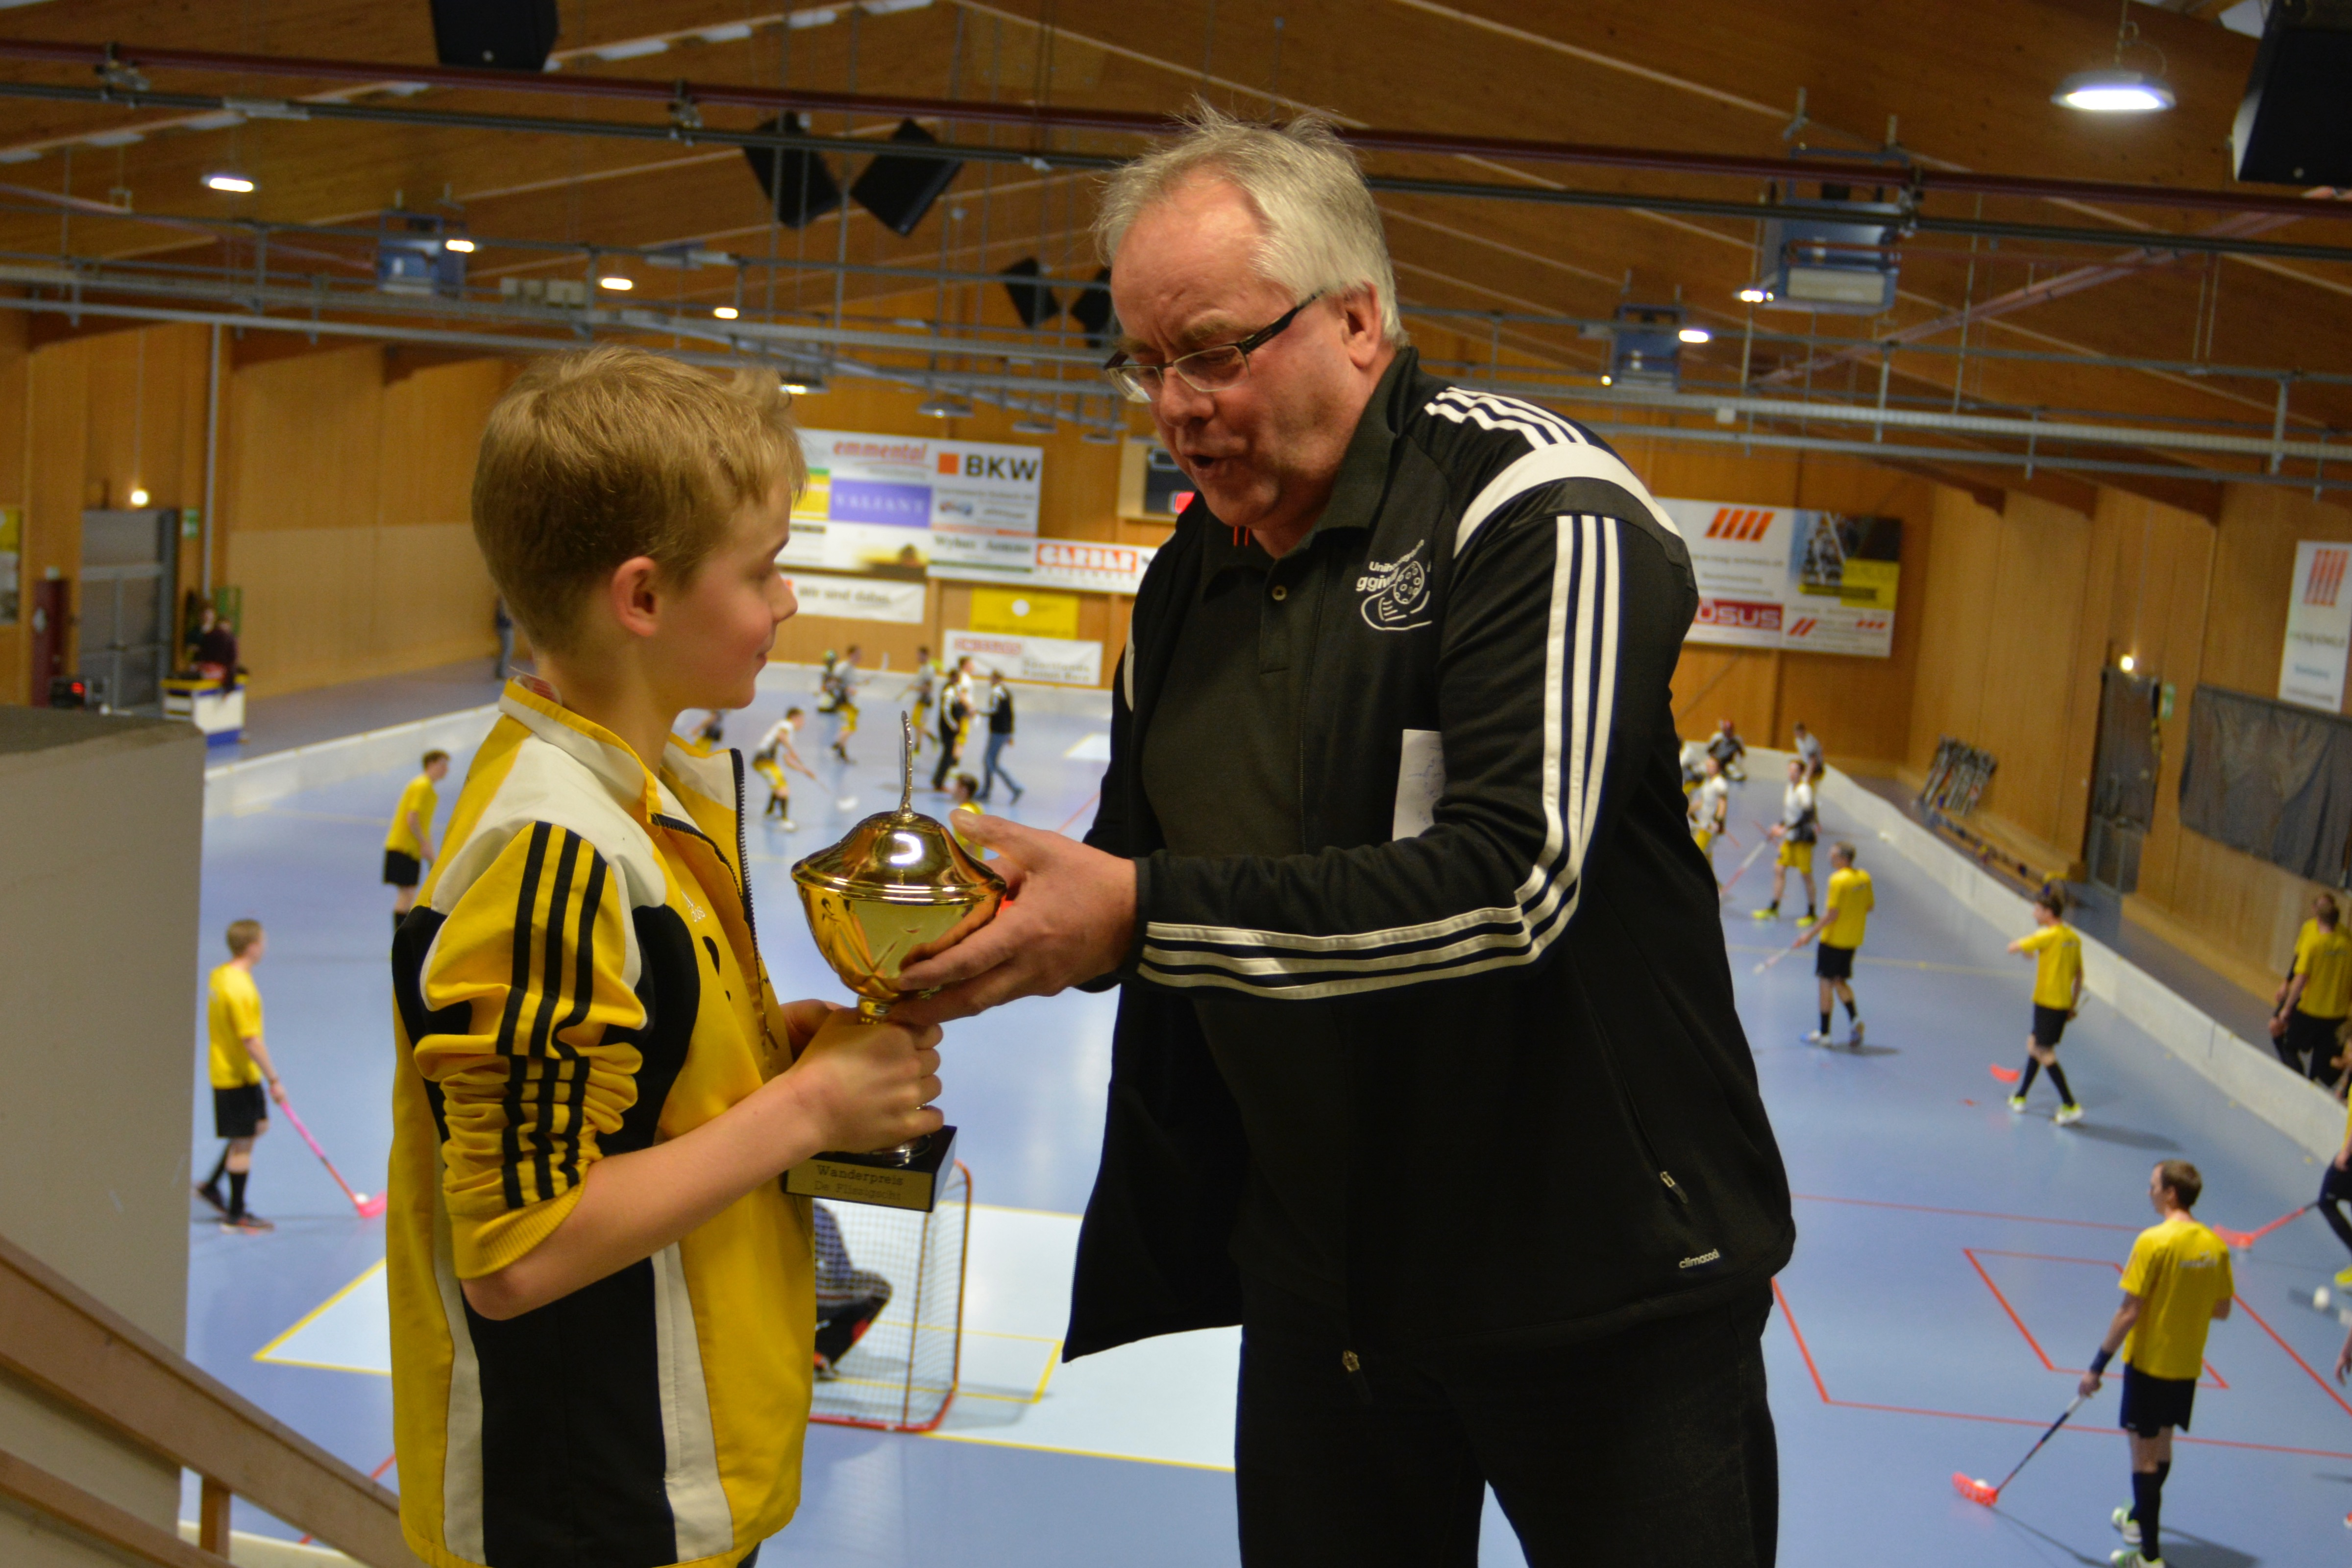 Verein - Sponsorenapero Saison 2015/16